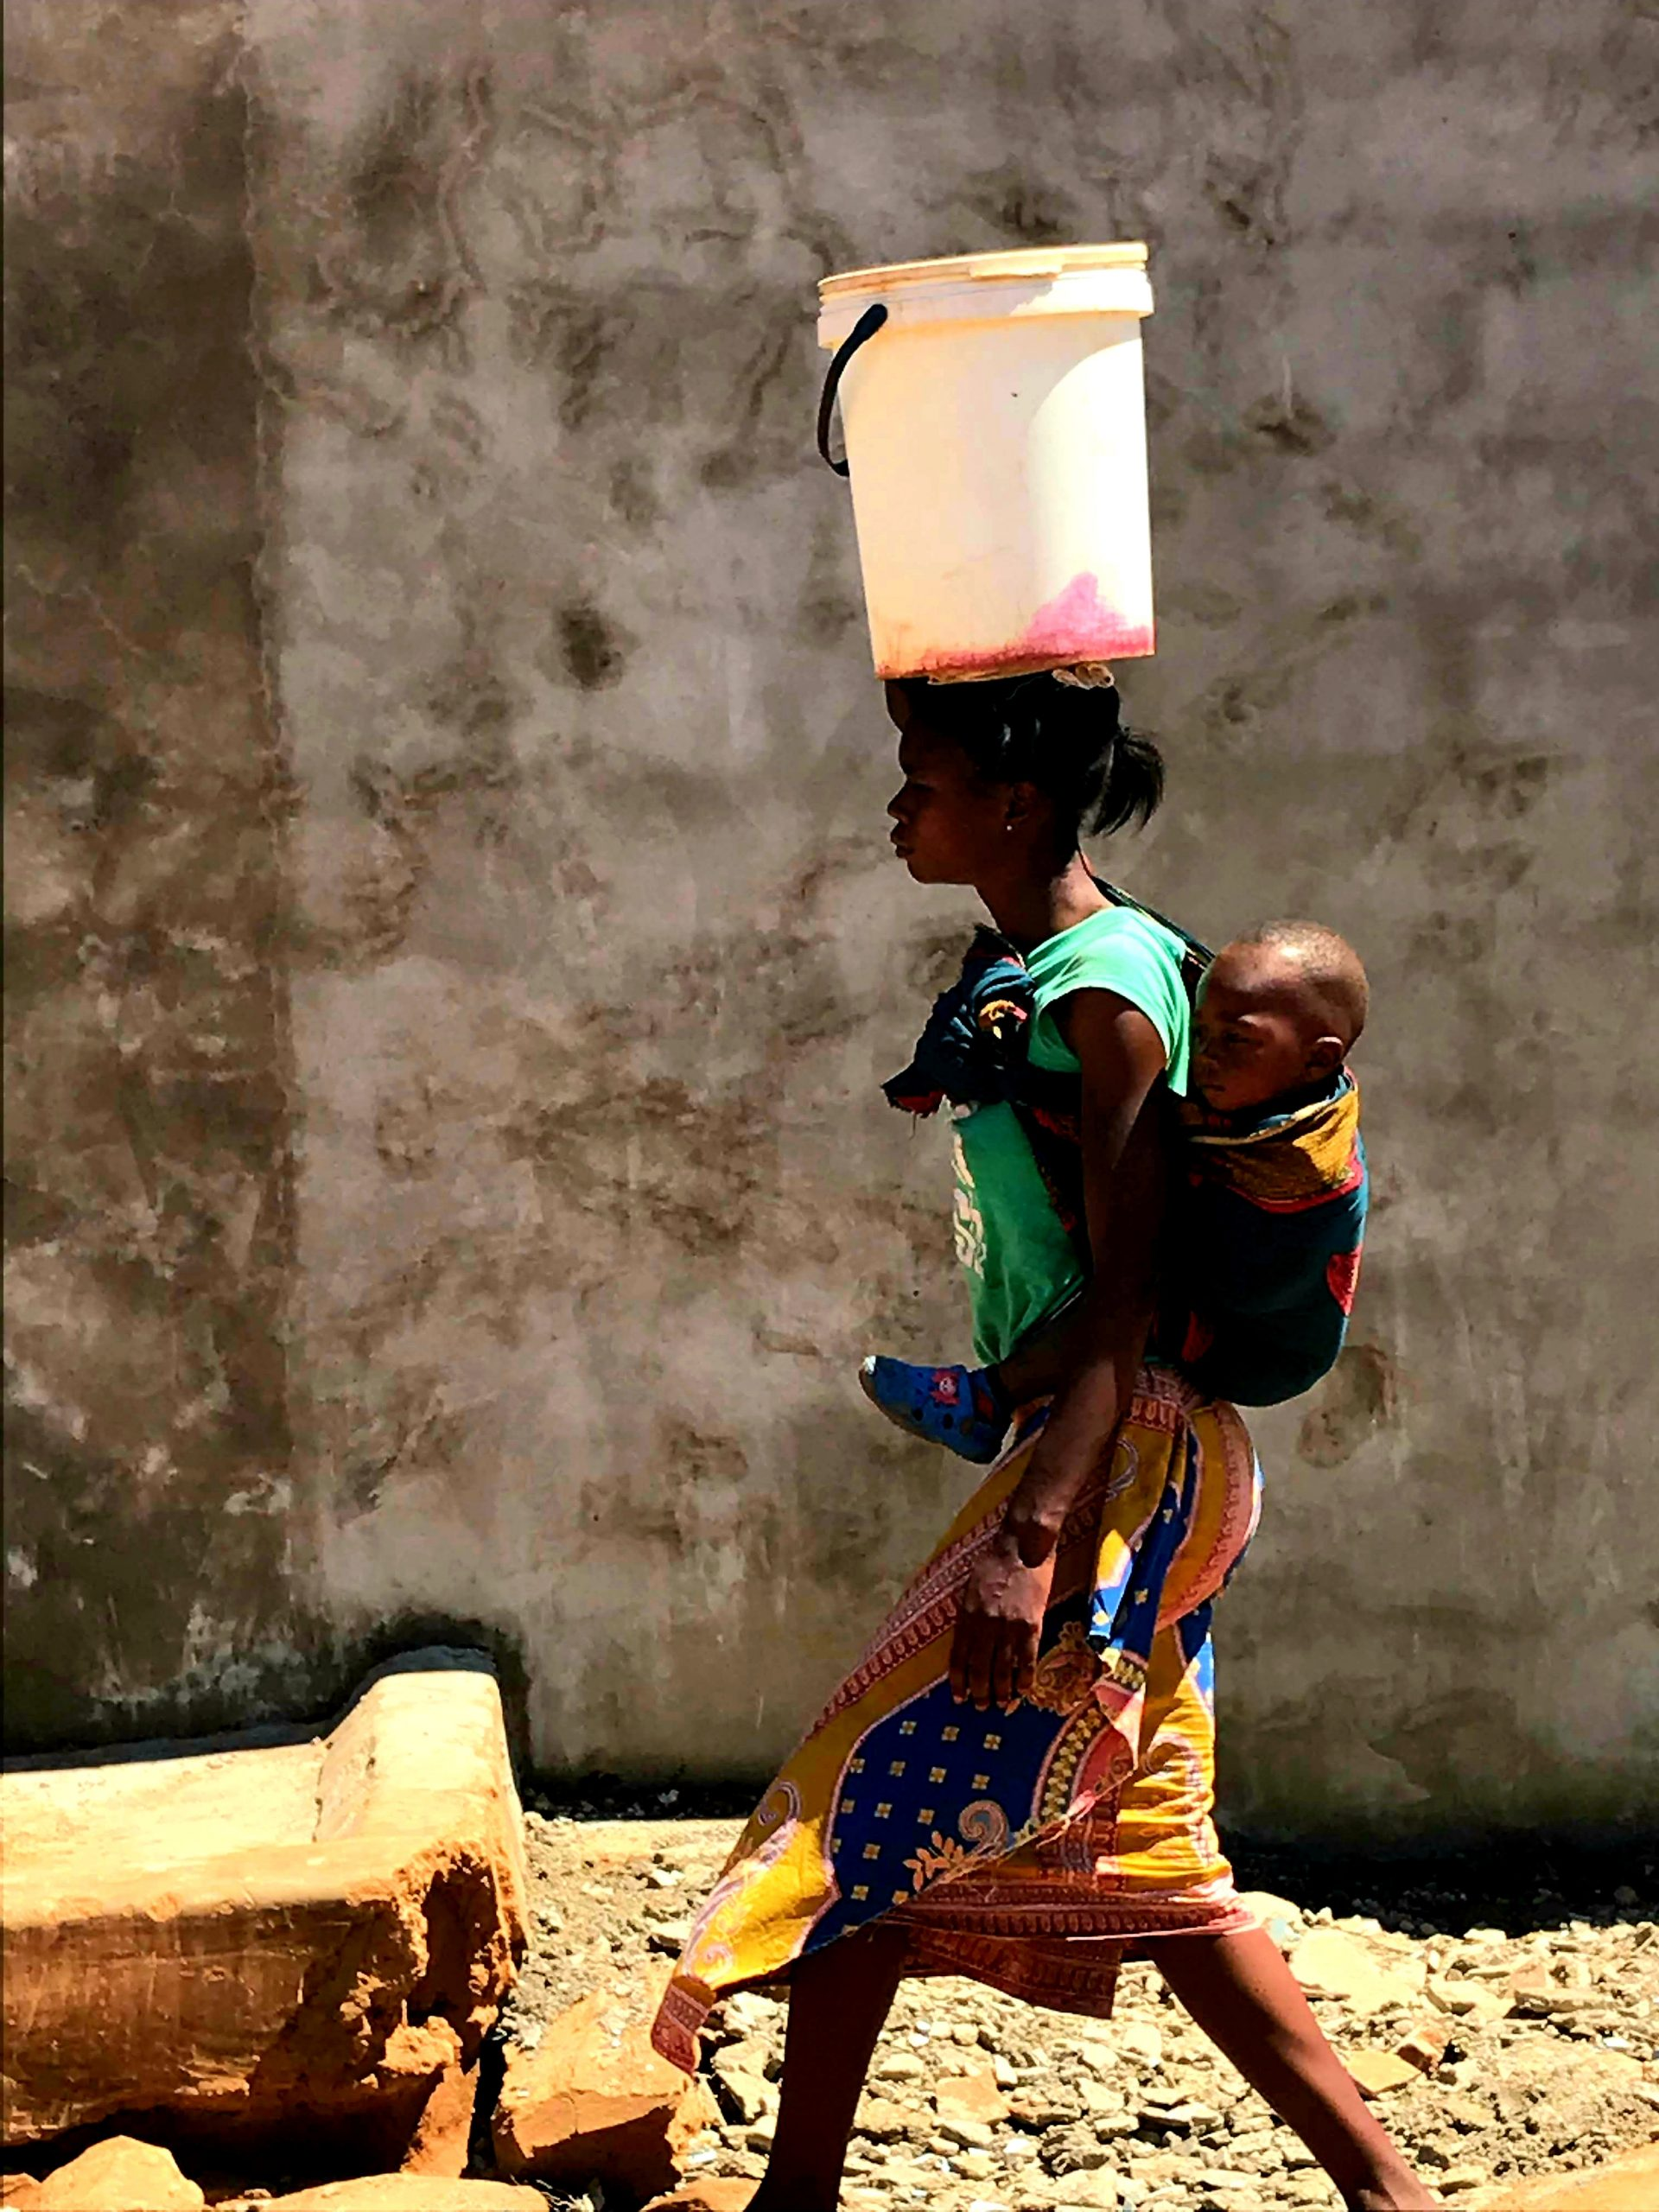 A woman walks in Jack Compound, Lusaka, Zambia.